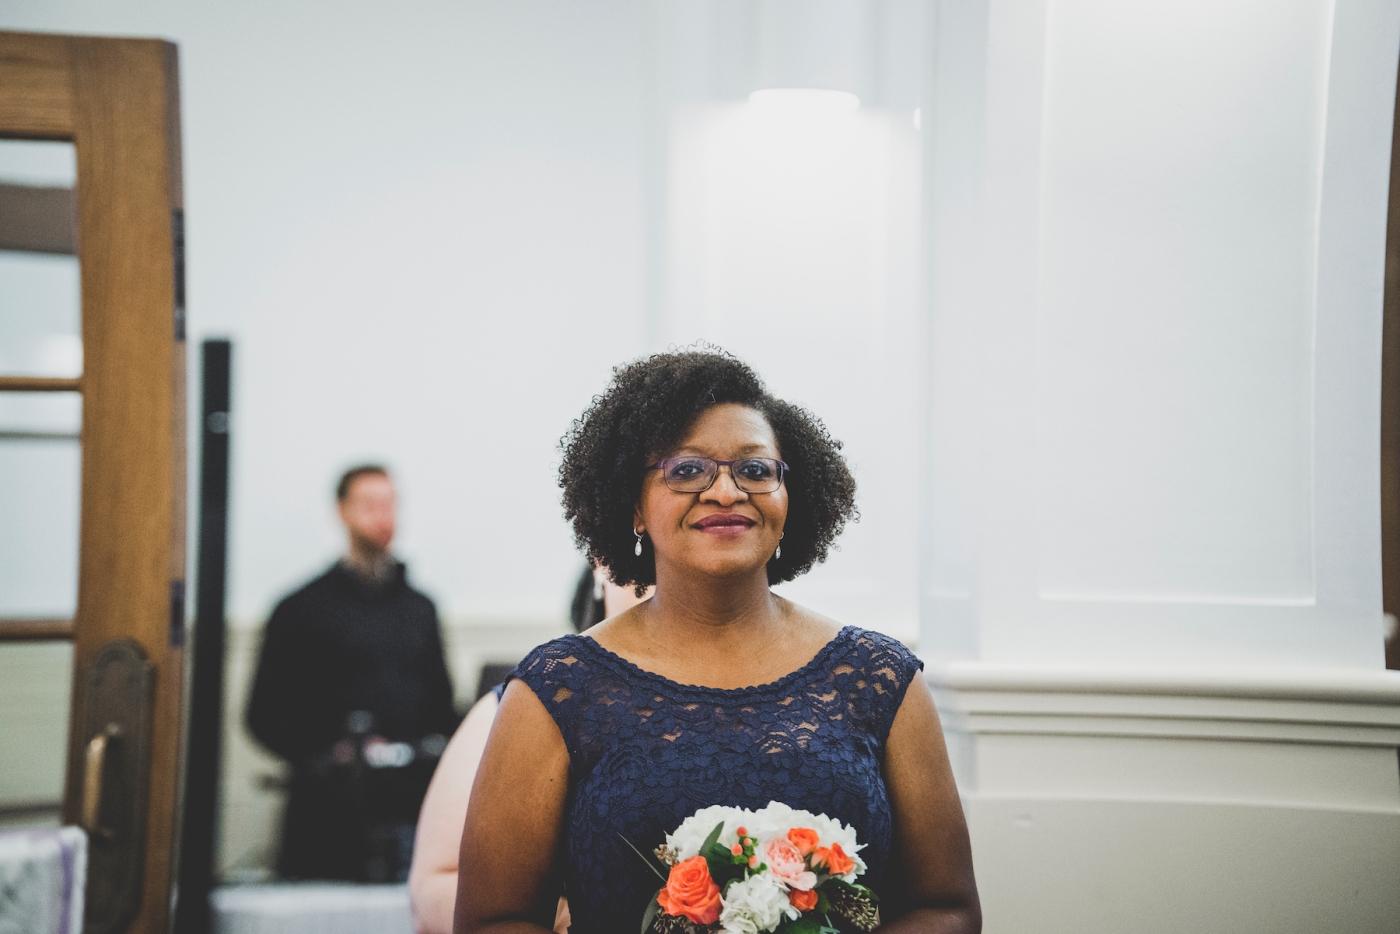 DSC_2502Everett_Wedding_Ballroom_Jane_Speleers_photography_Rachel_and_Edmund_Ceremony_2017